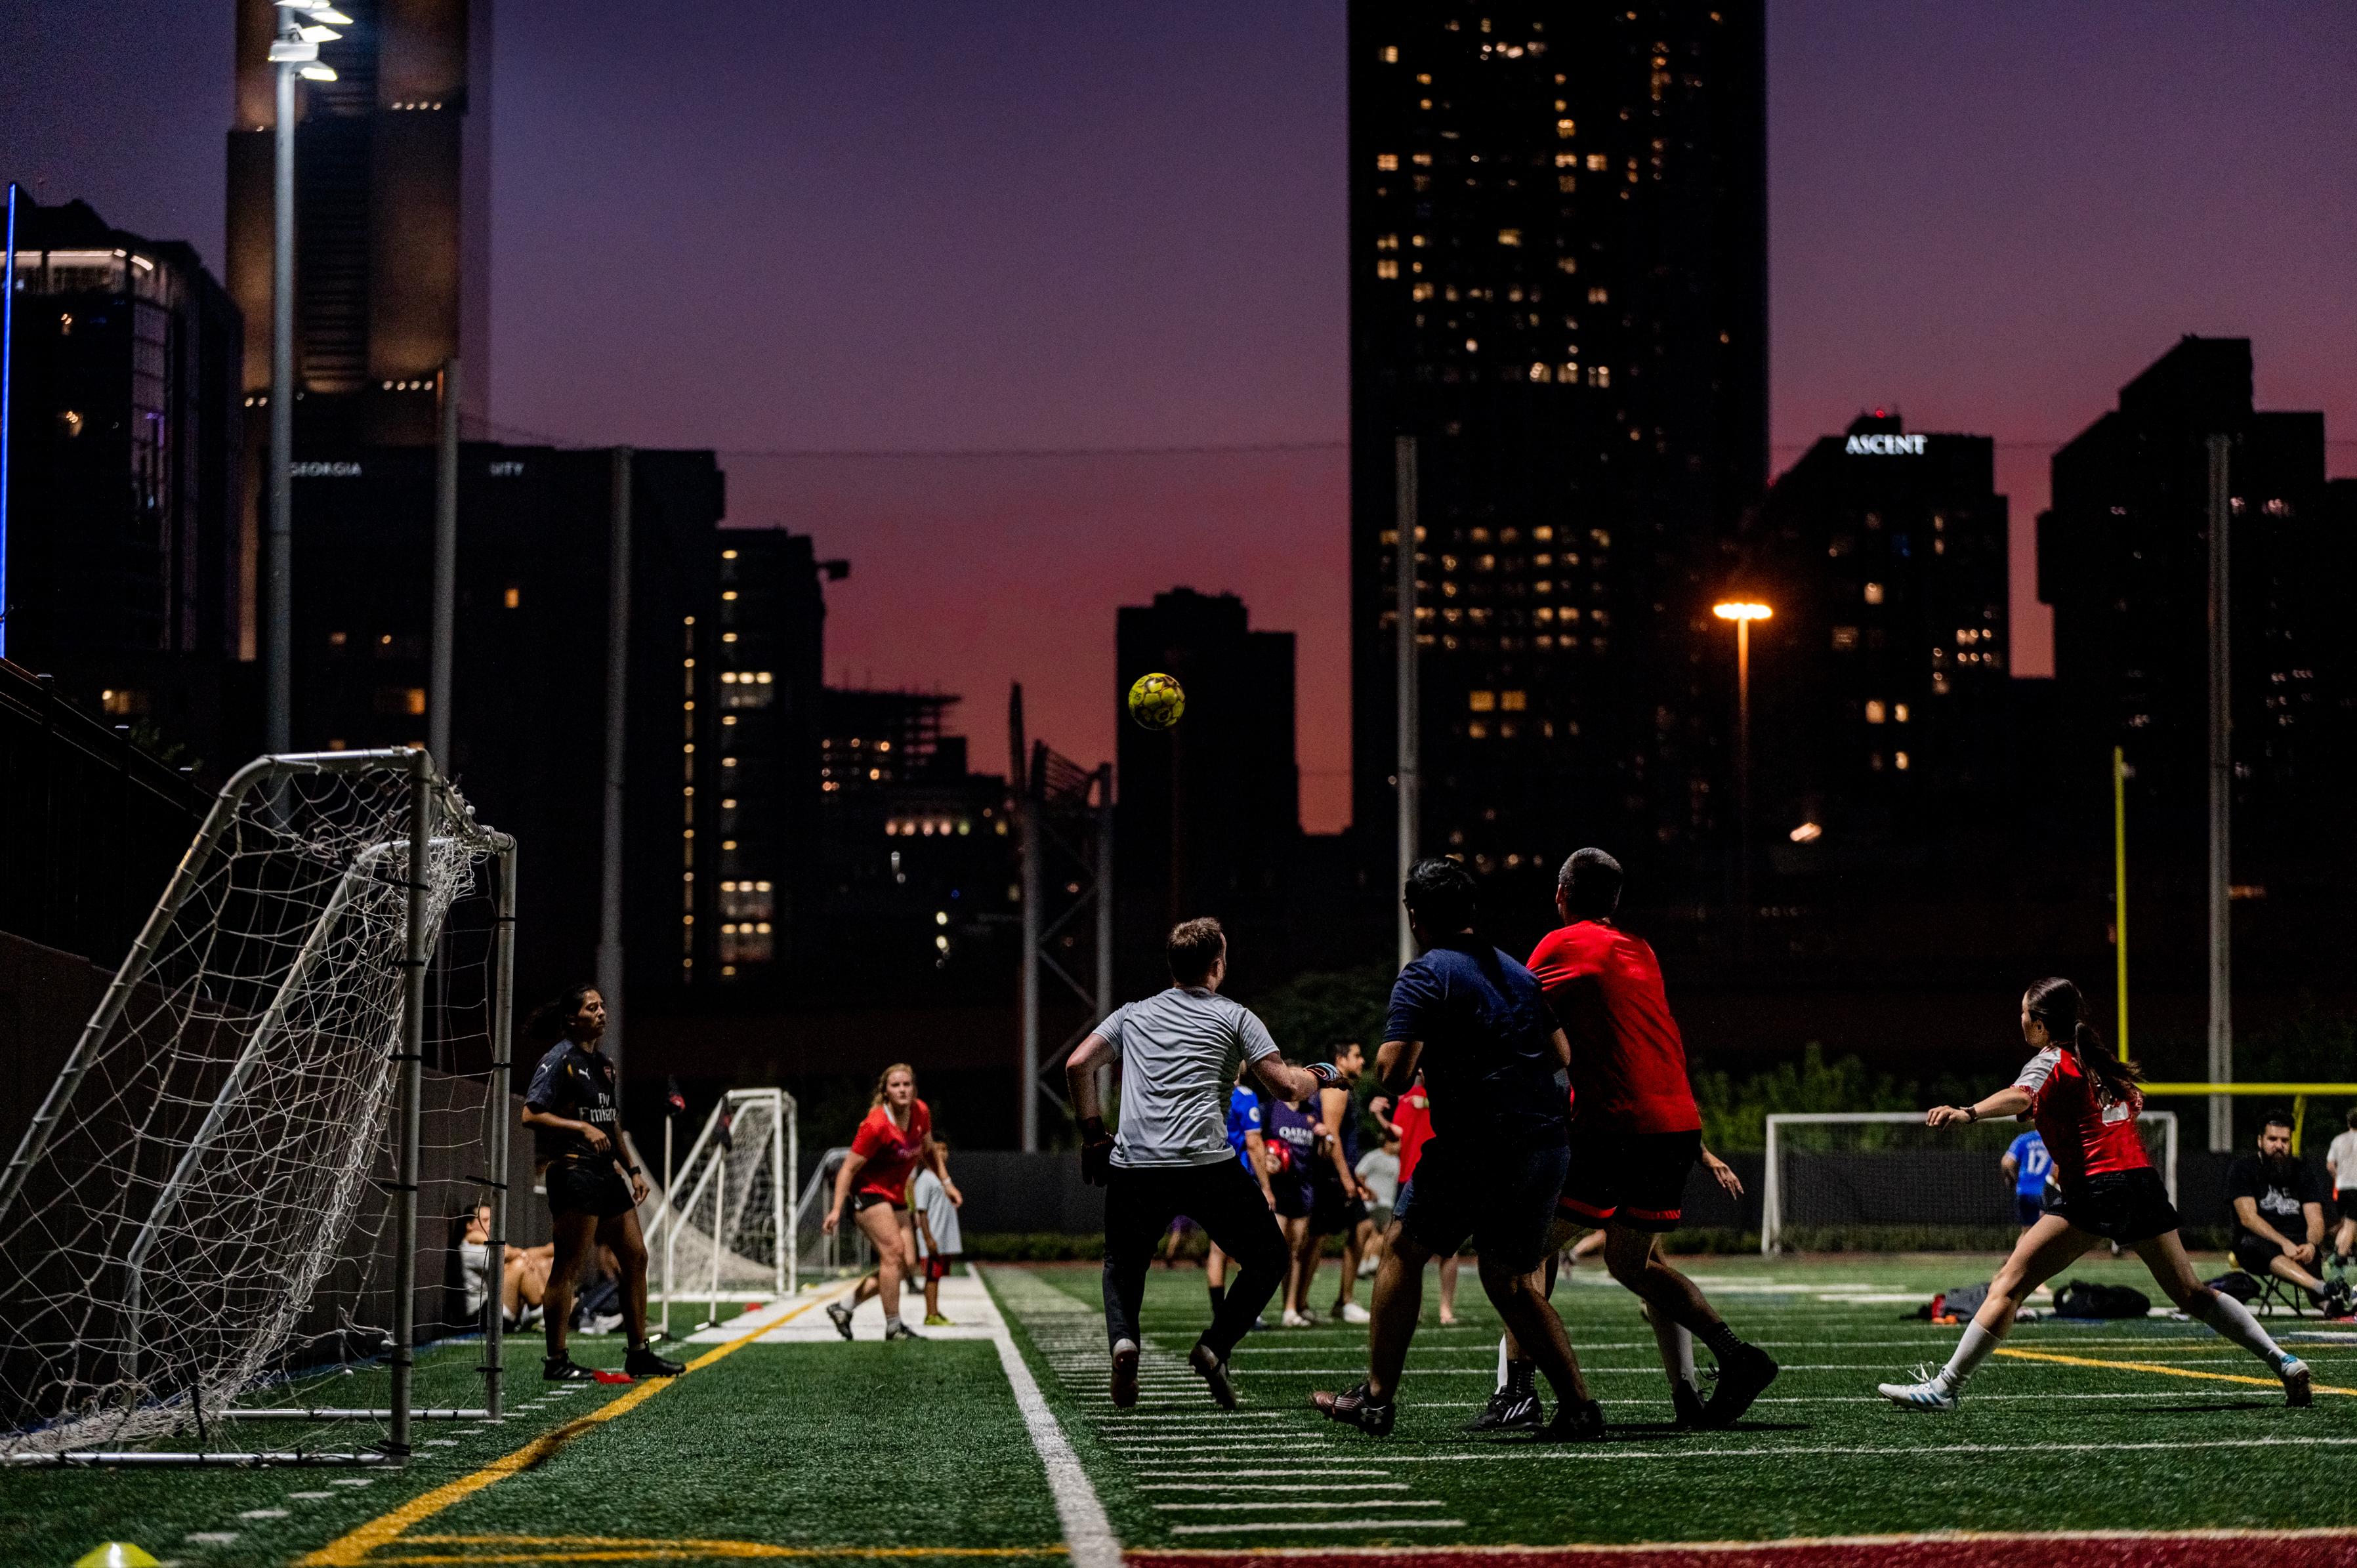 Adult Soccer Leagues in Atlanta